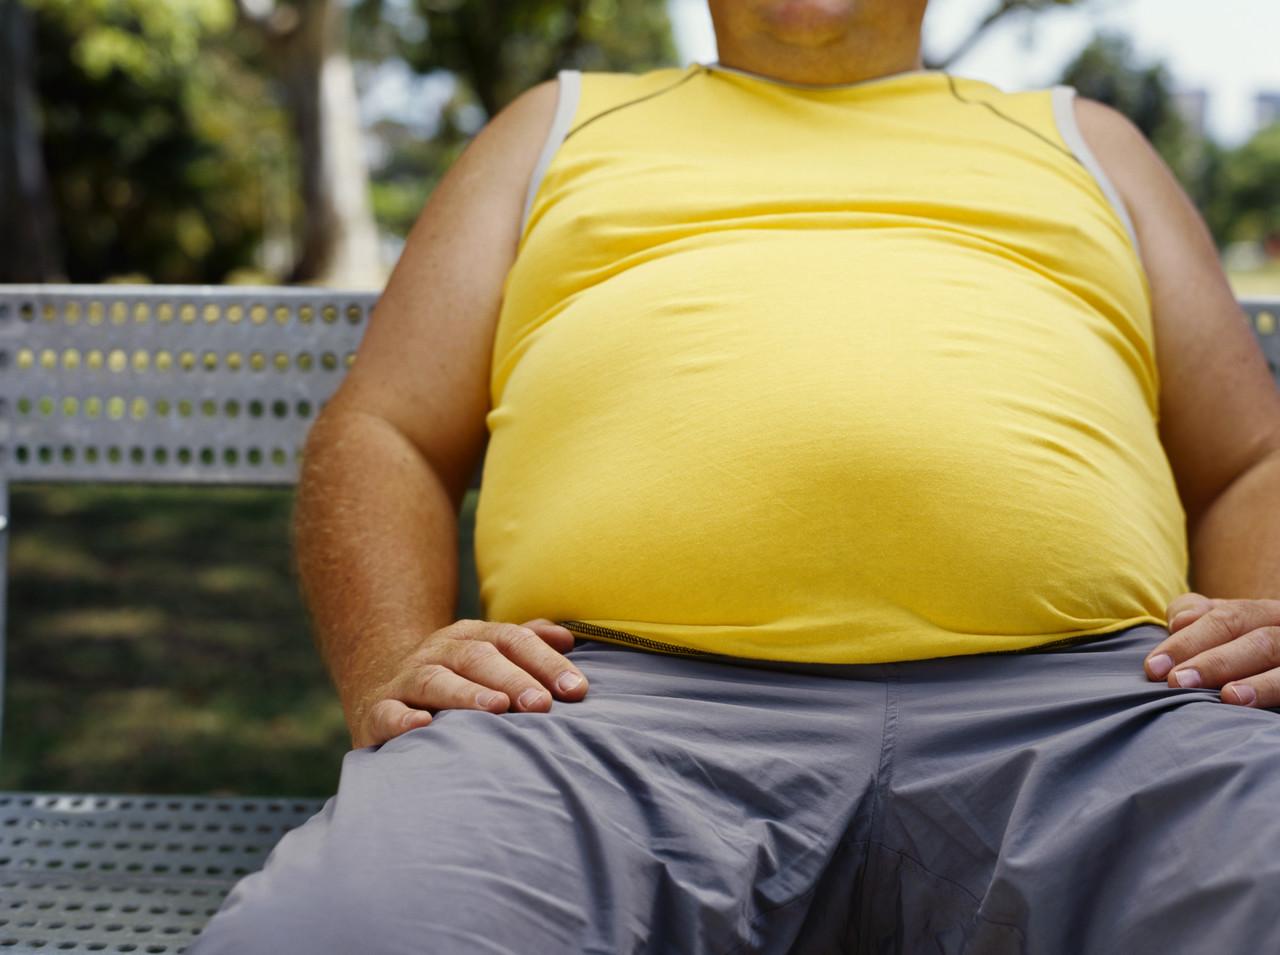 obese - Lazy Sunday - Anonymous Diary Blog